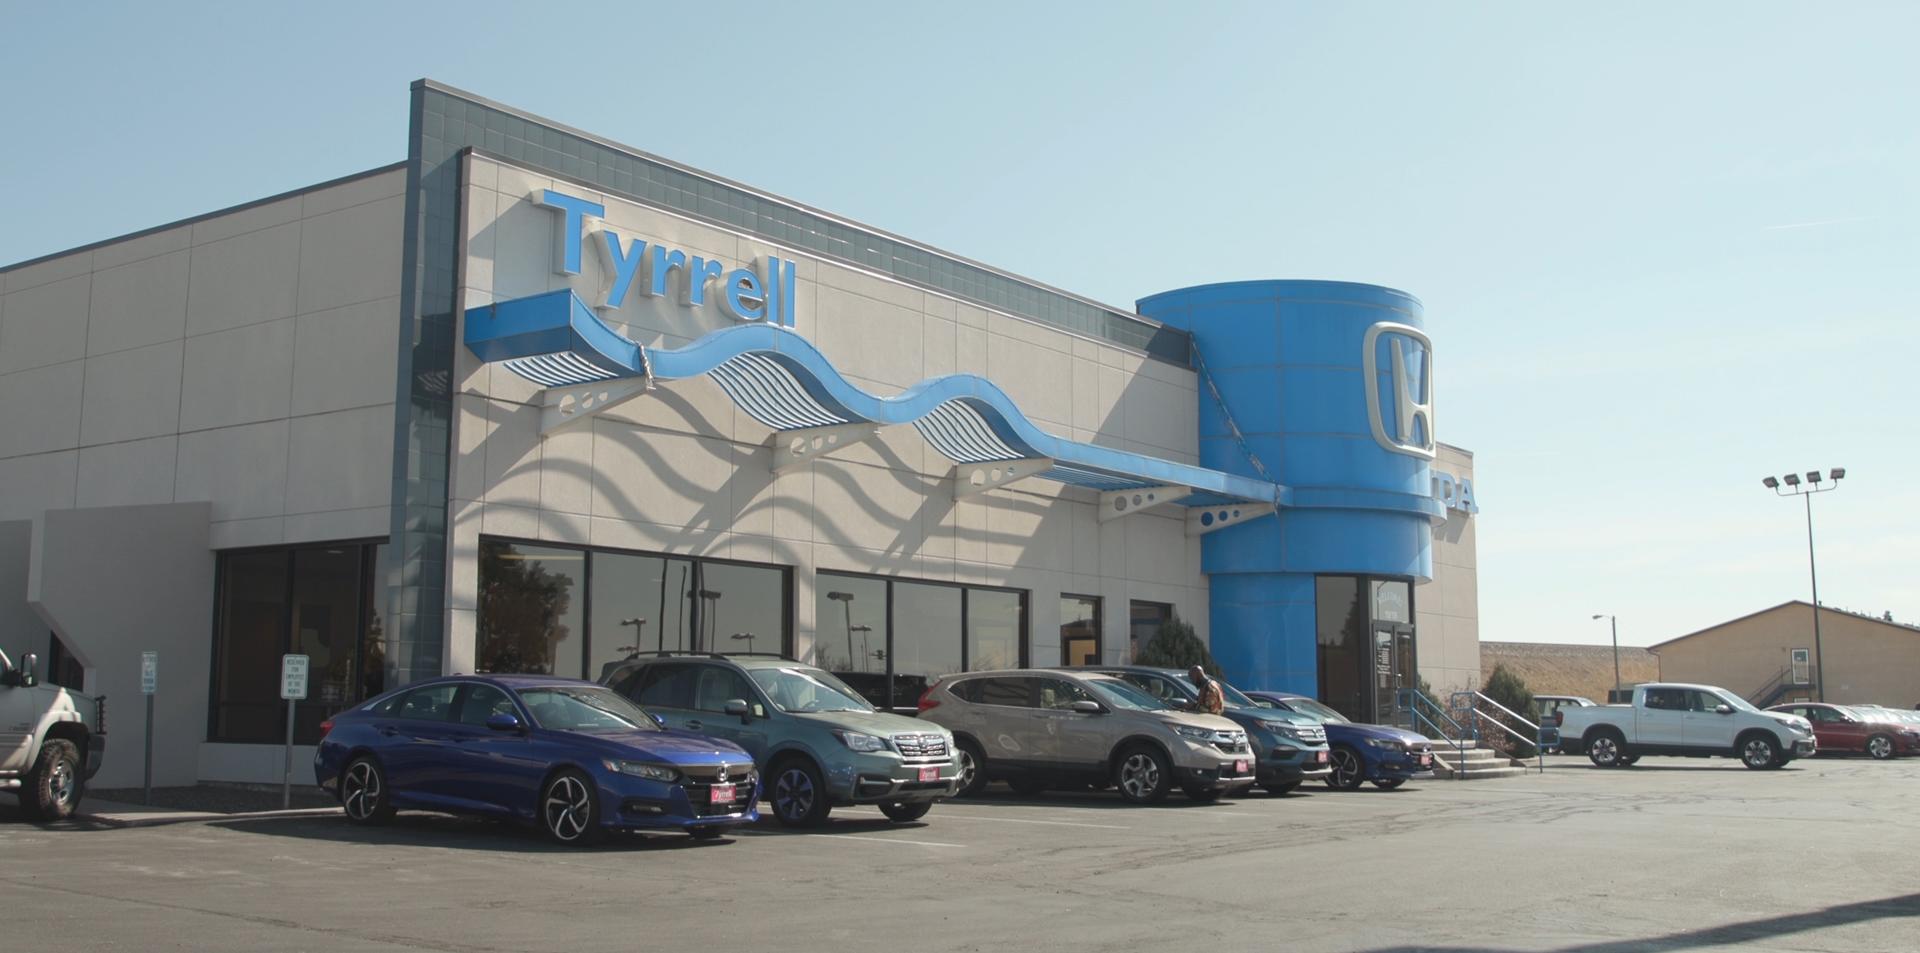 Tyrrell dealership